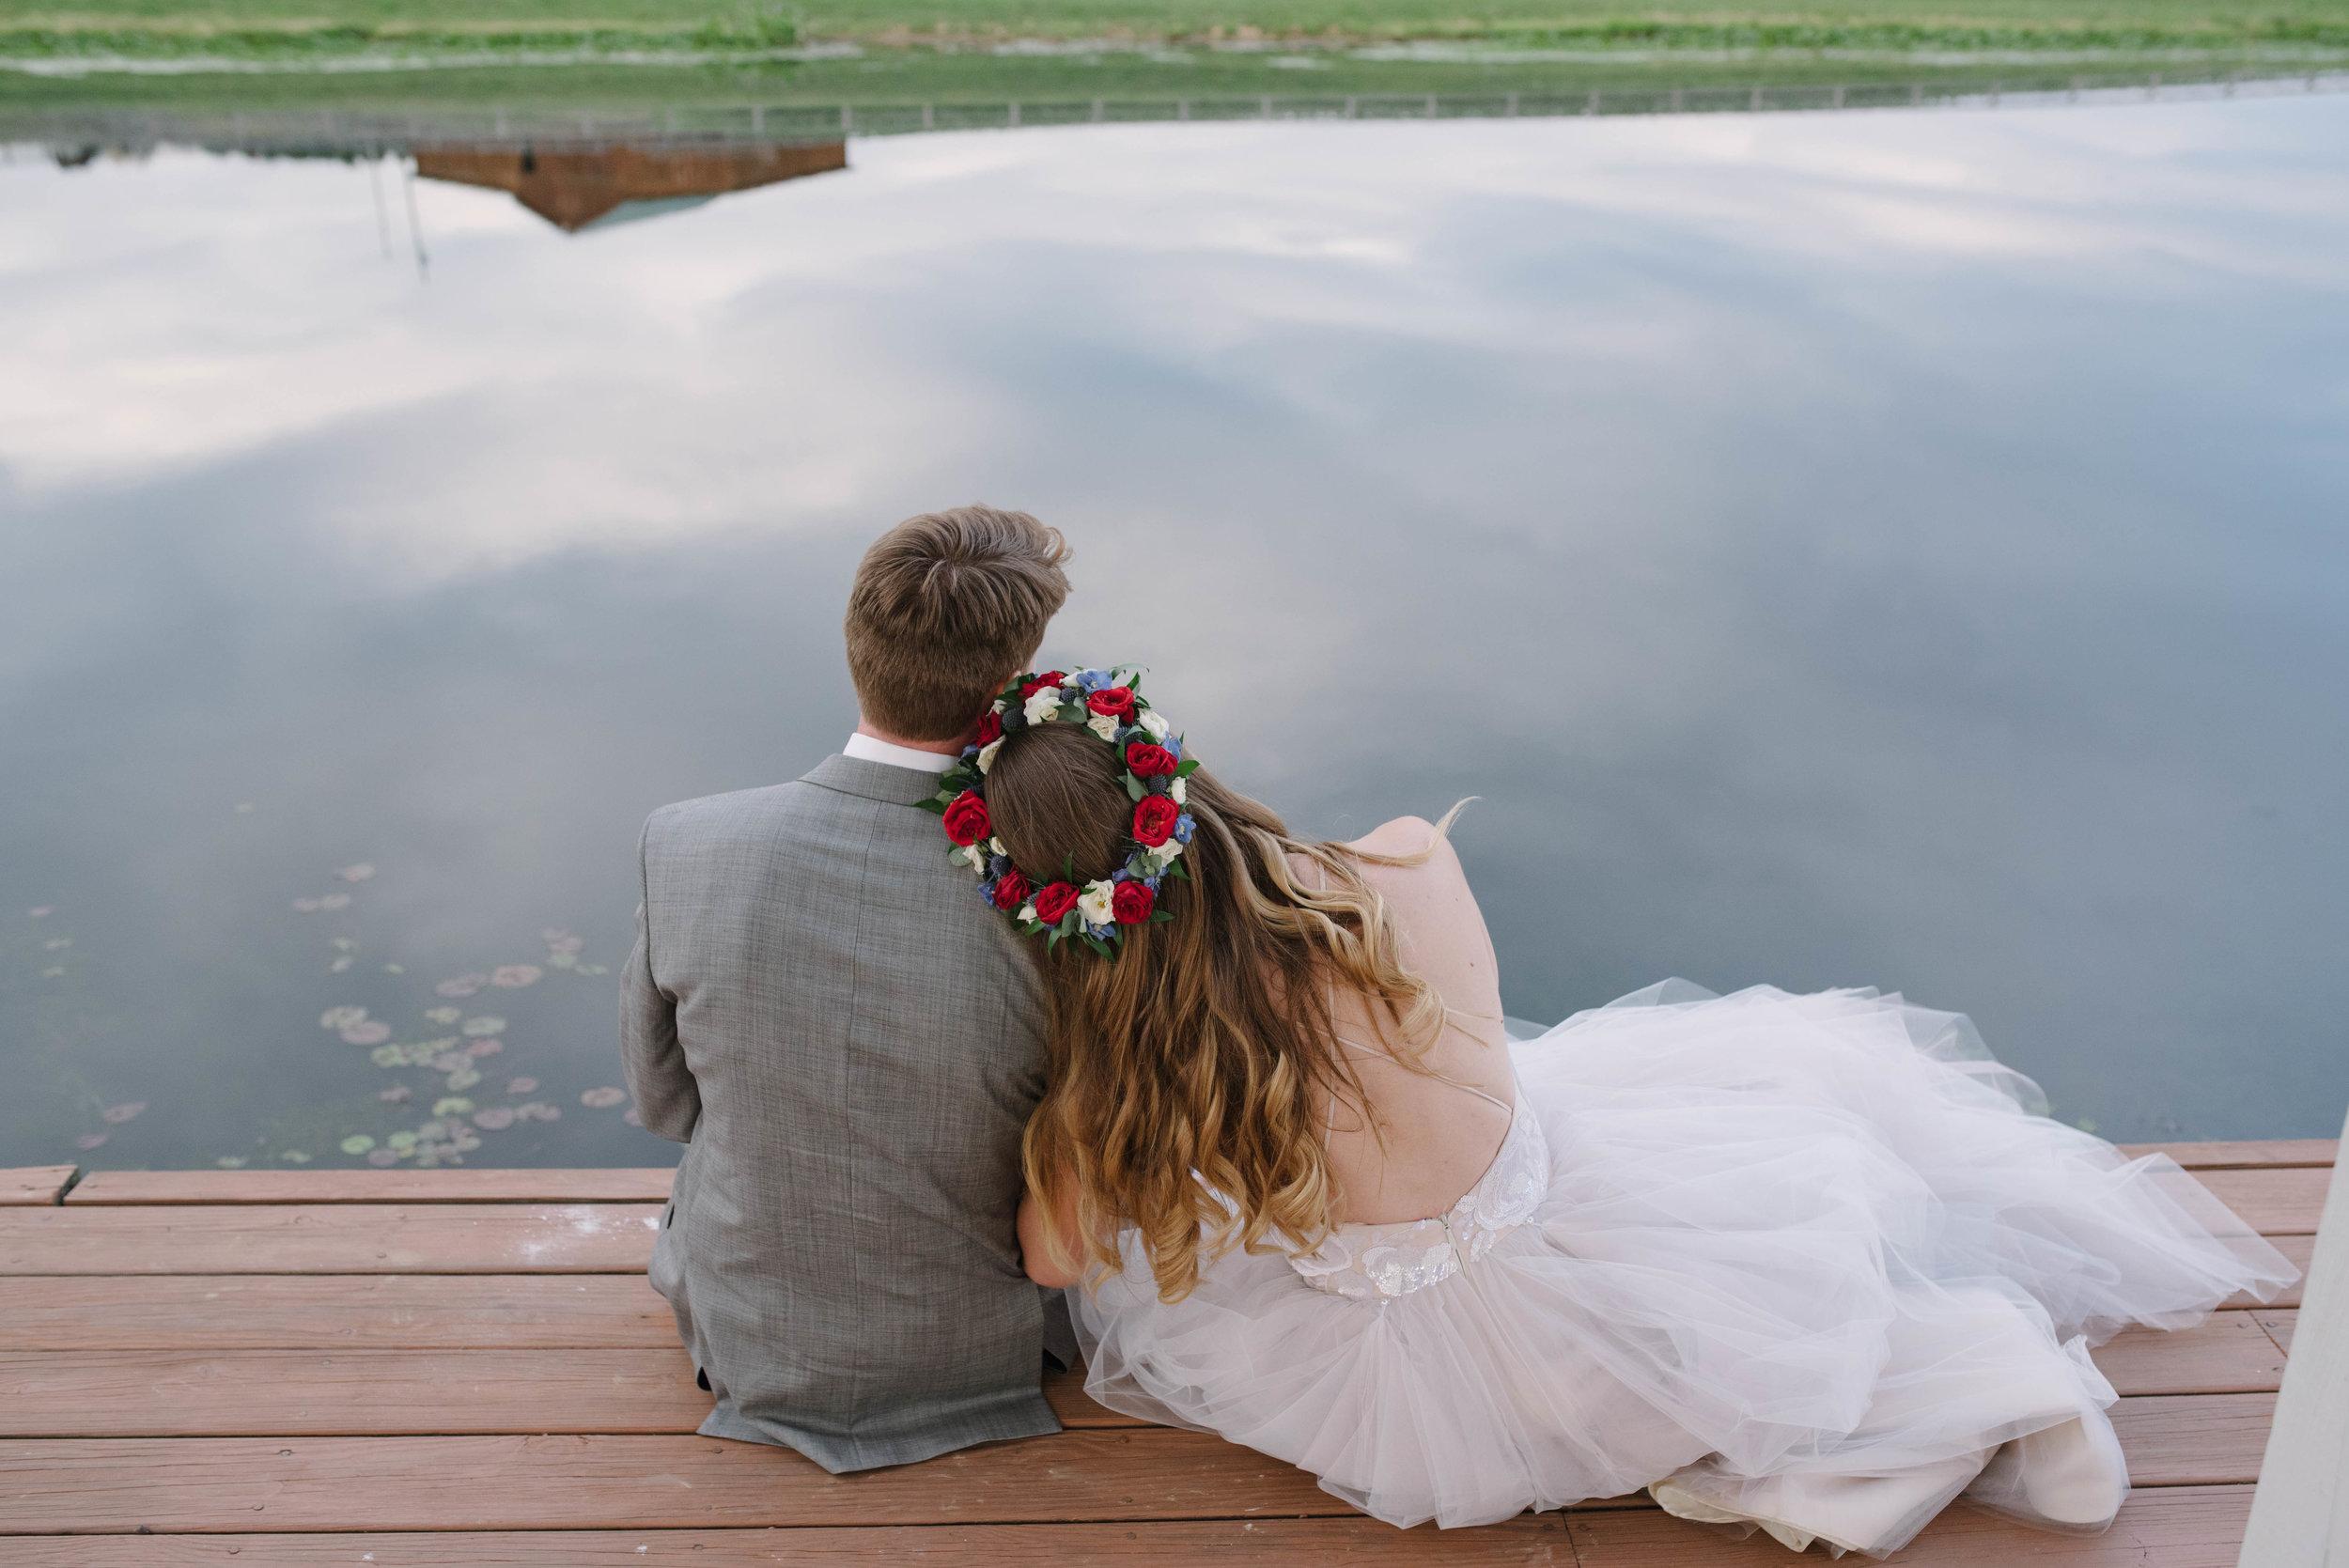 Lingrow Farm Wedding Portrait on lake